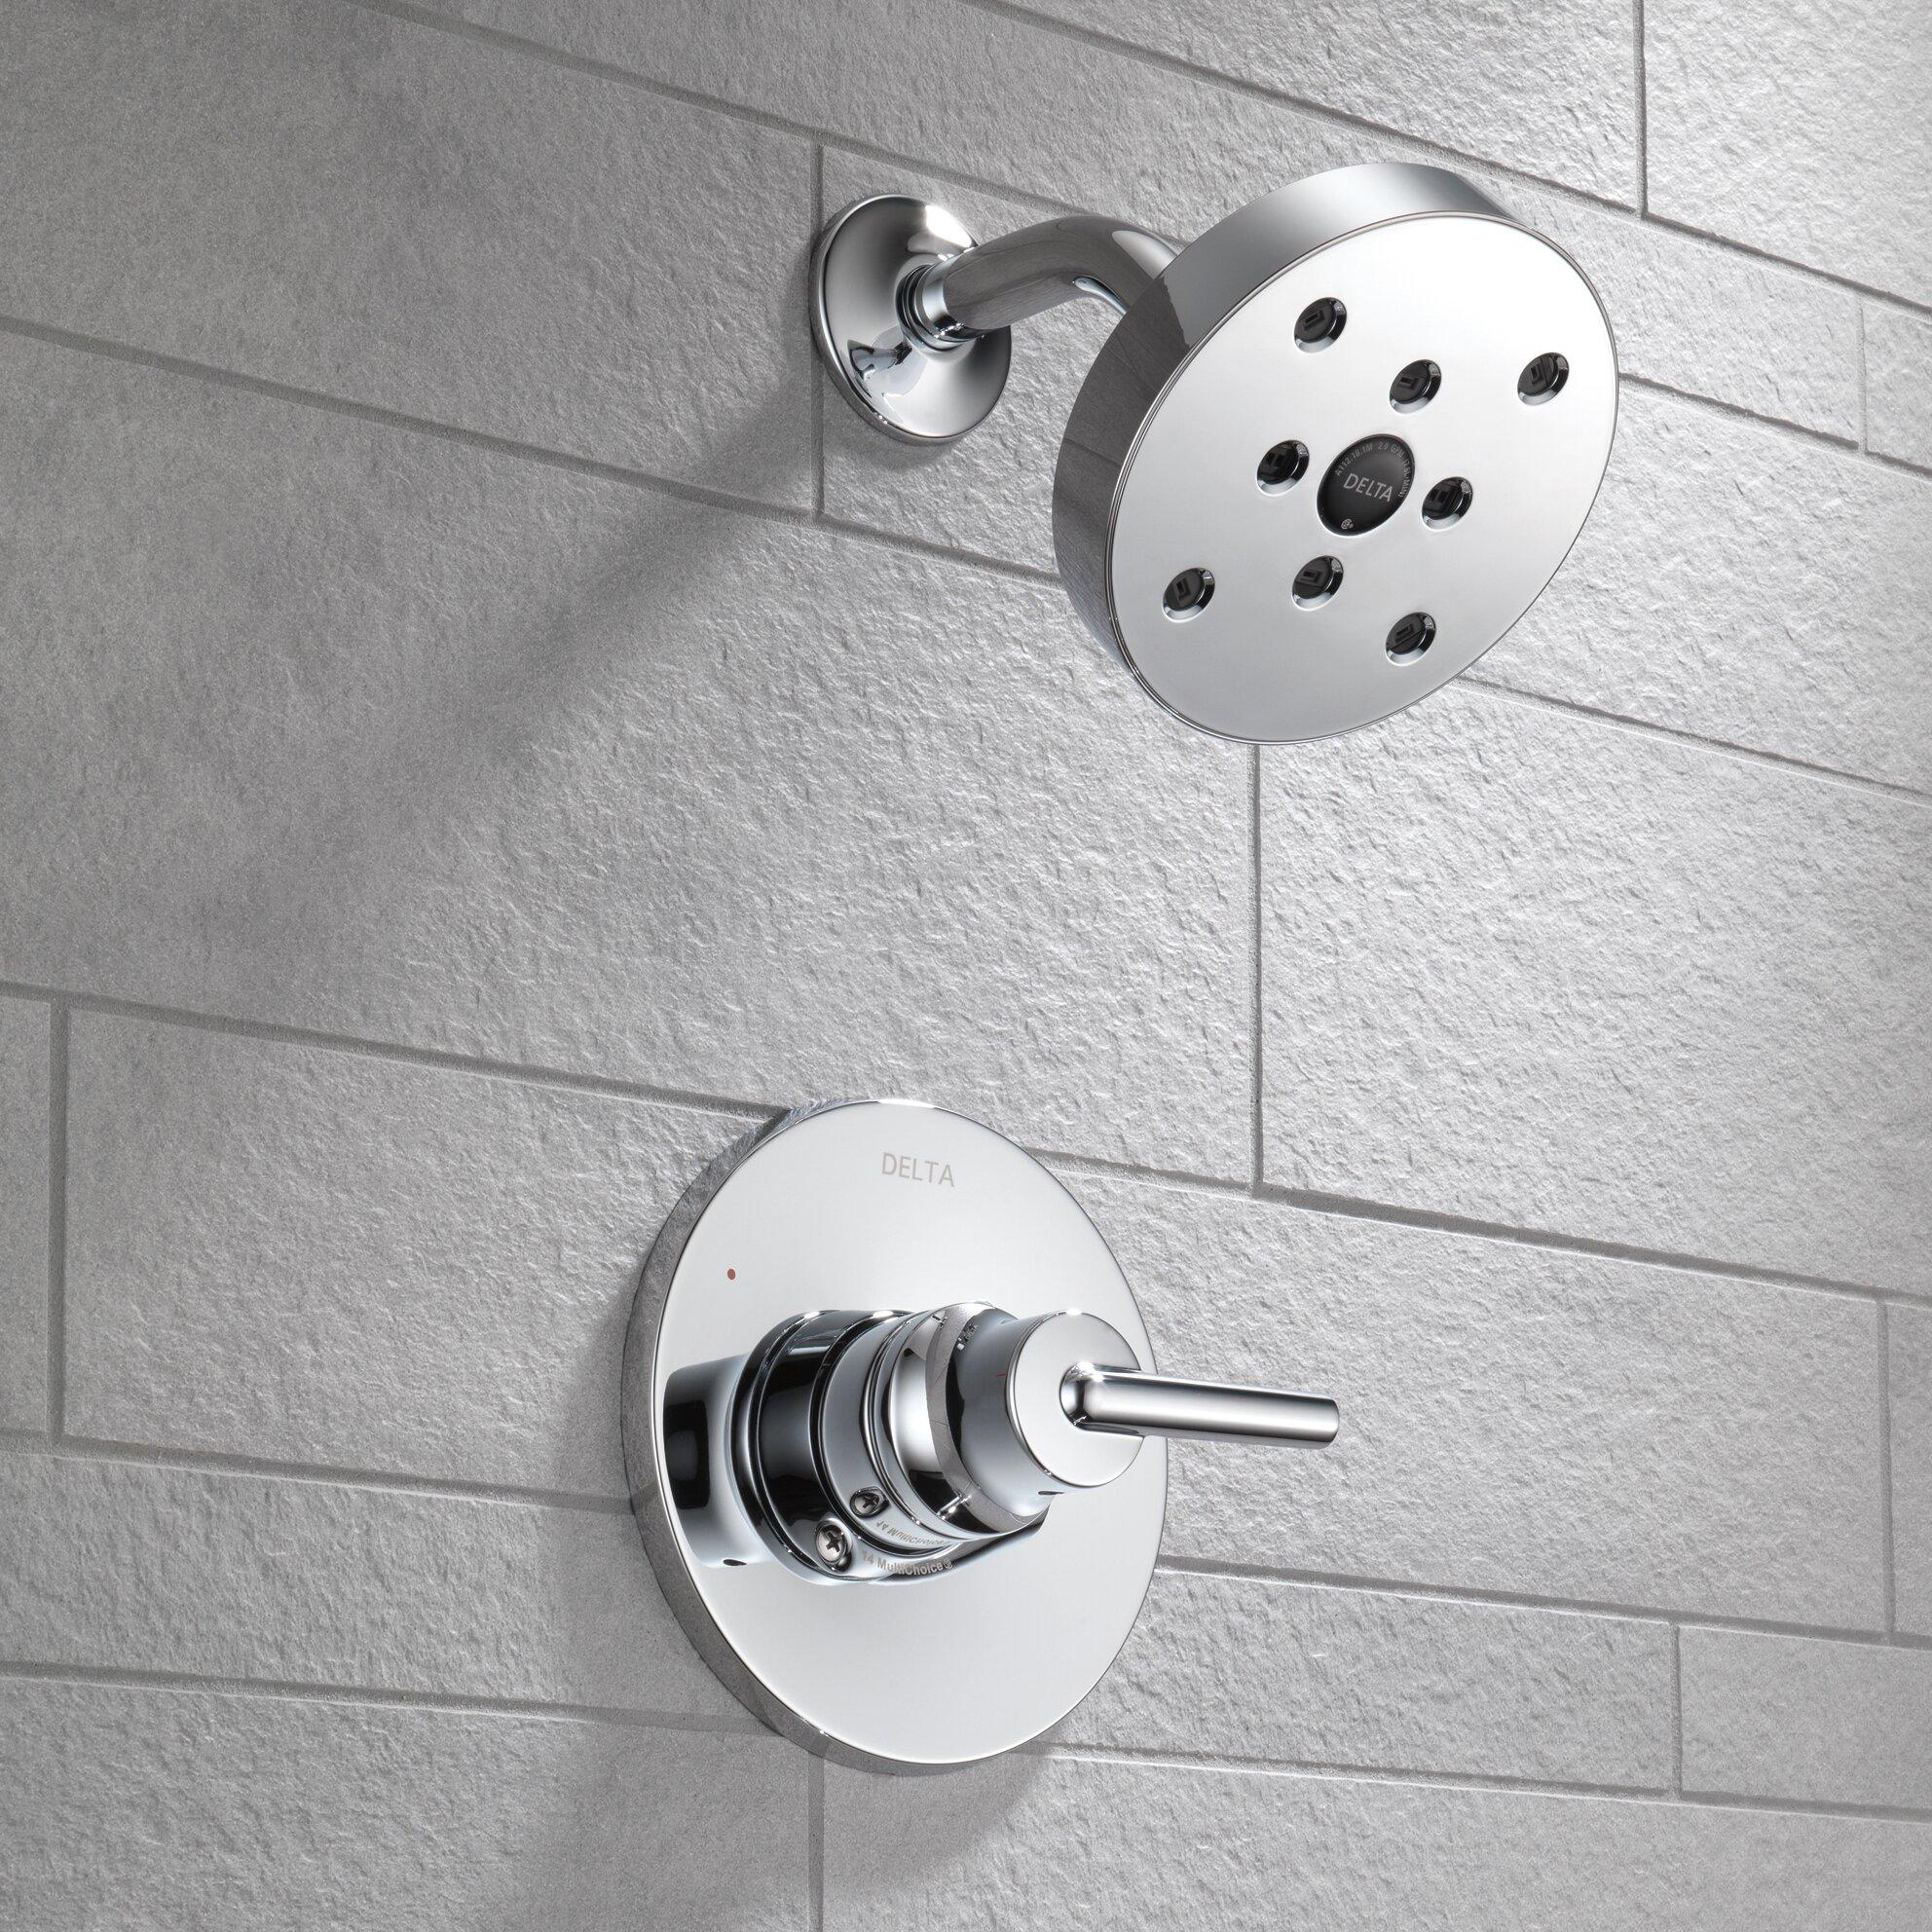 Bathroom showers head - Trinsic Bathroom Shower Faucet Trim With Lever Handles